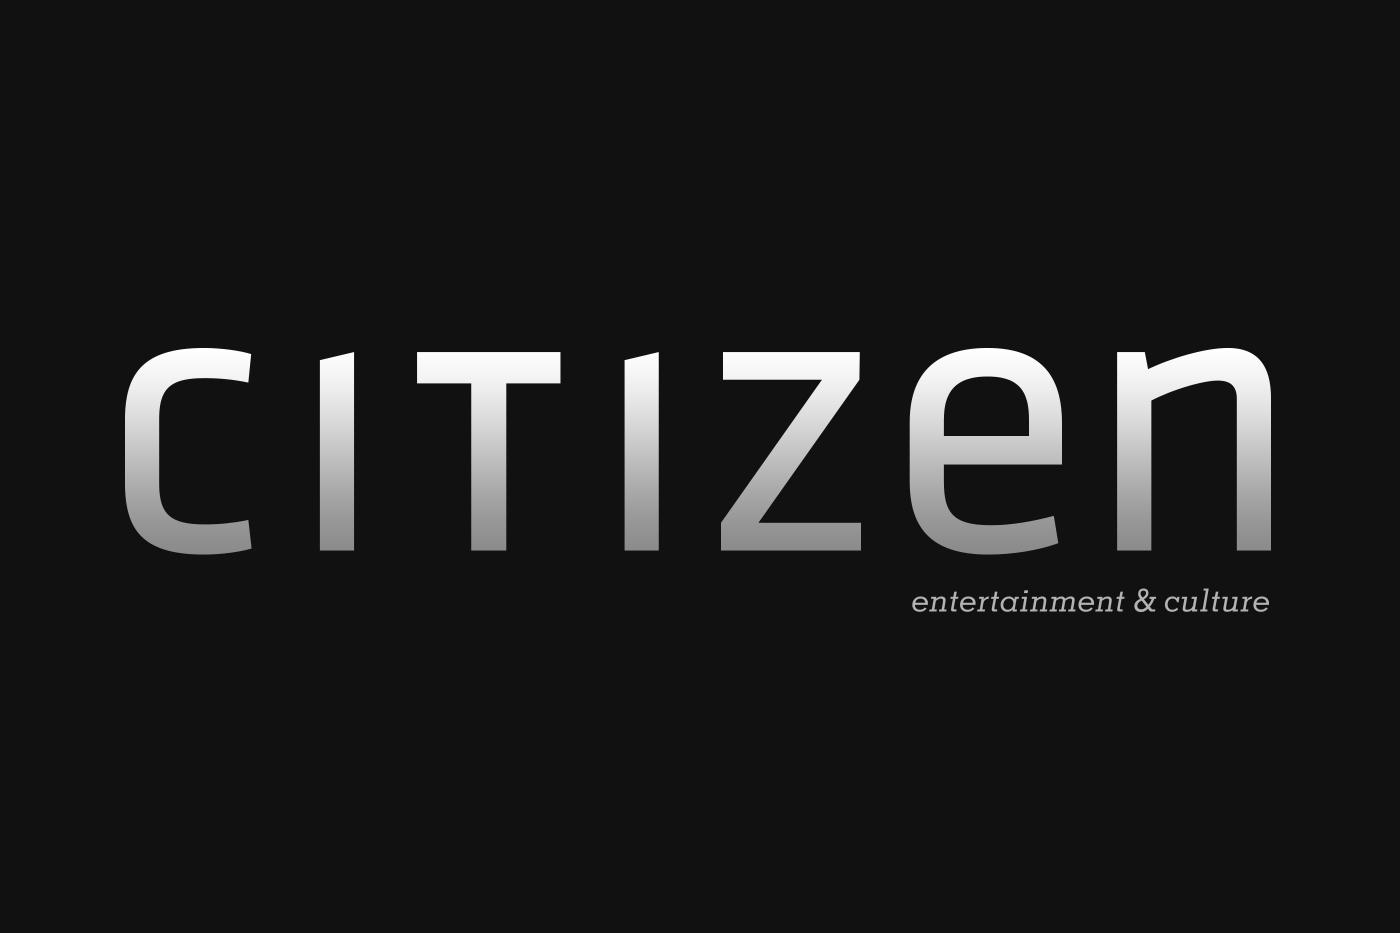 citezen-logo